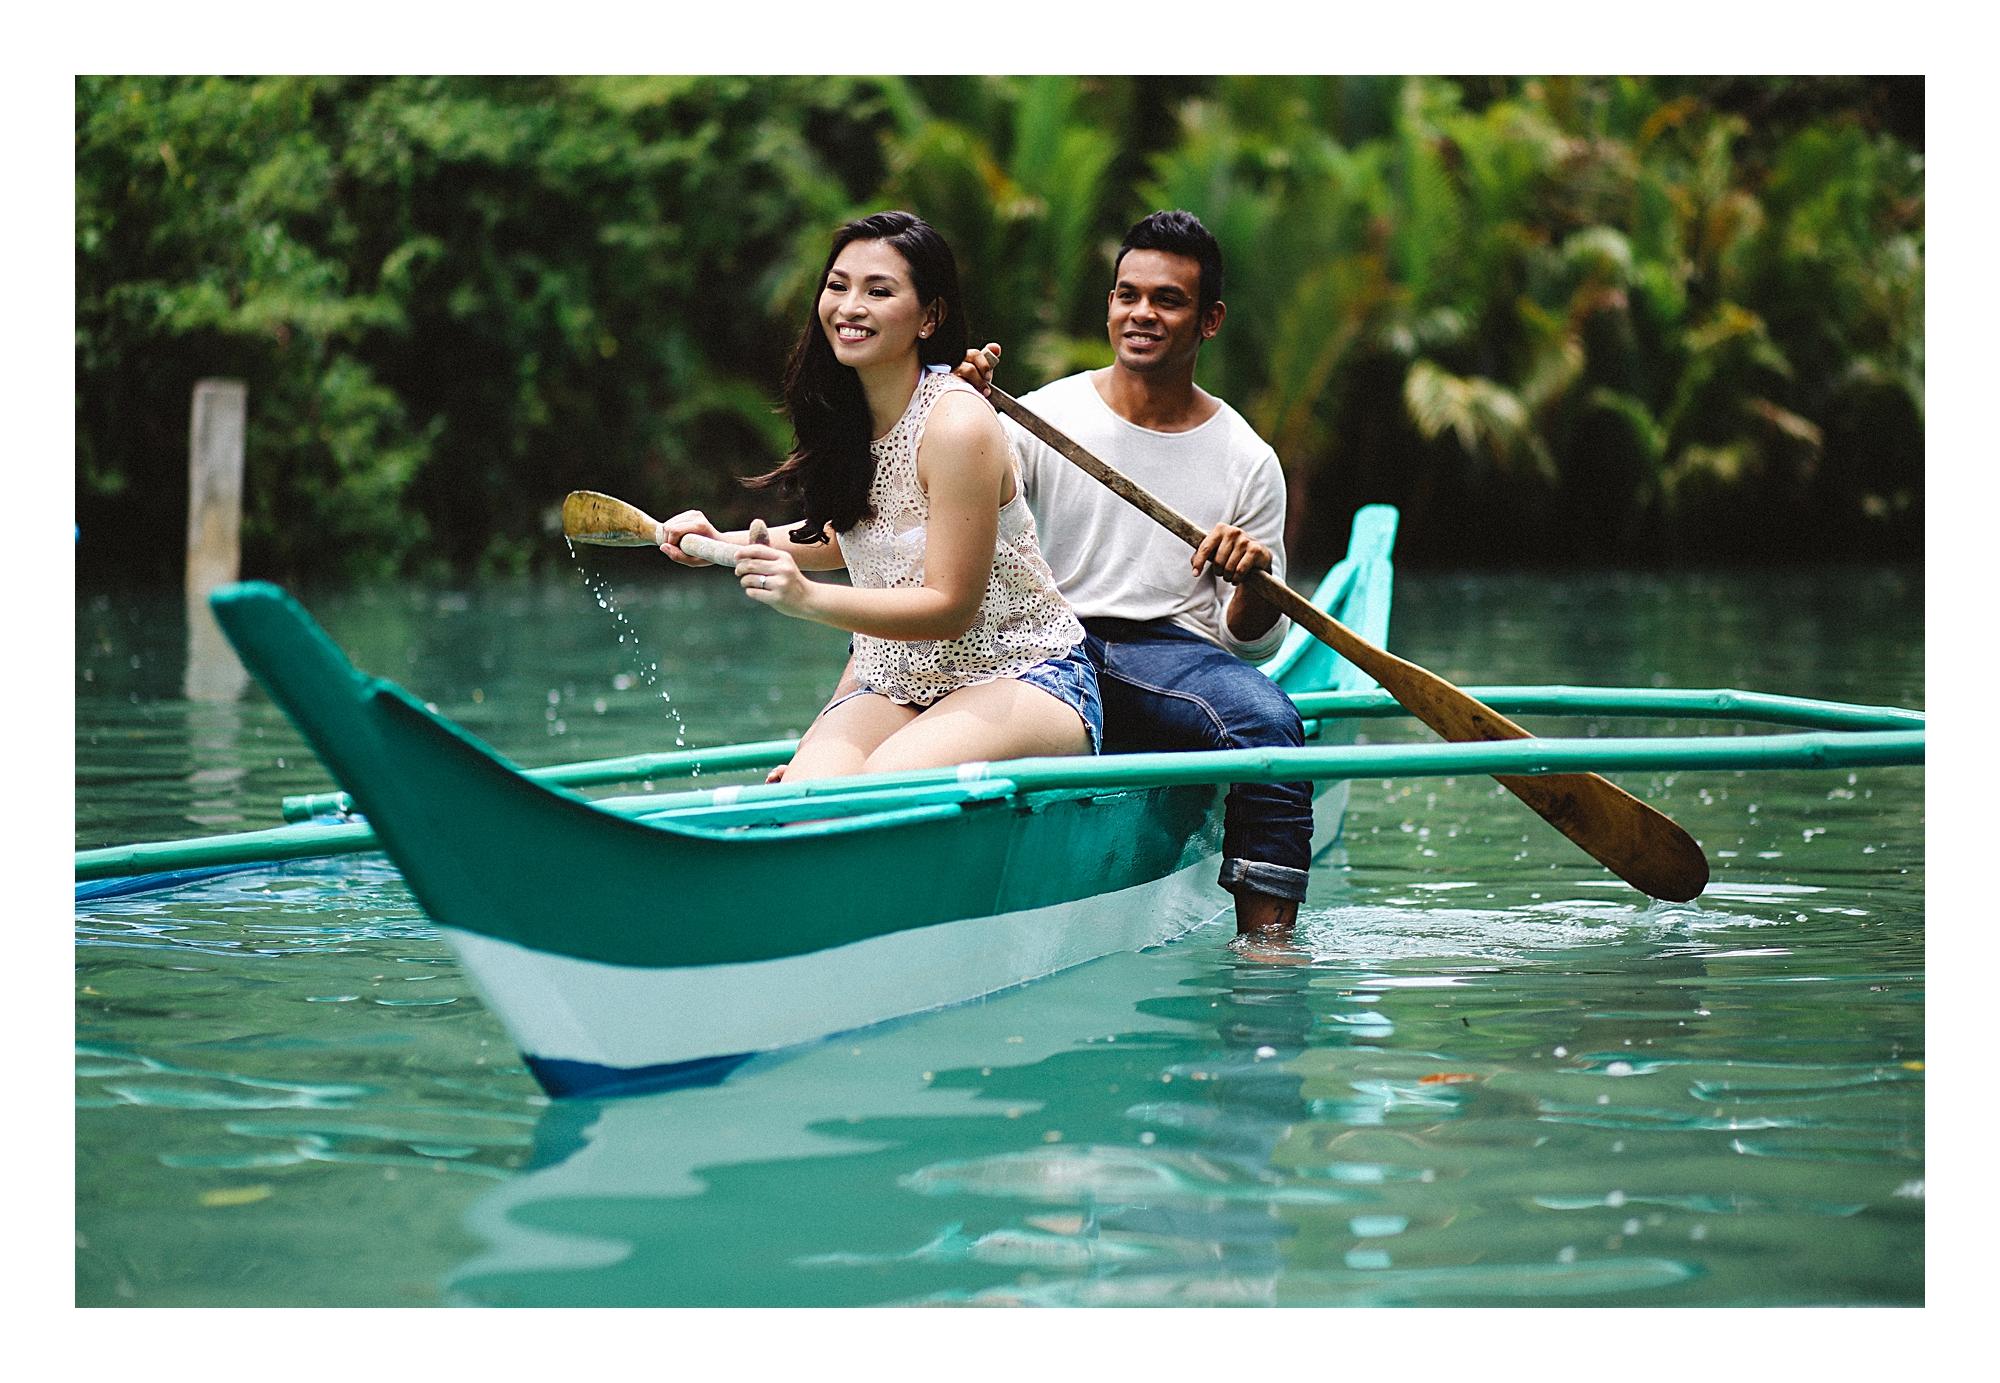 filipino-themed-engagement-redhorse-beer-aloguinsan-cebu-philippines-prenup-destination-wedding-photographer_0294